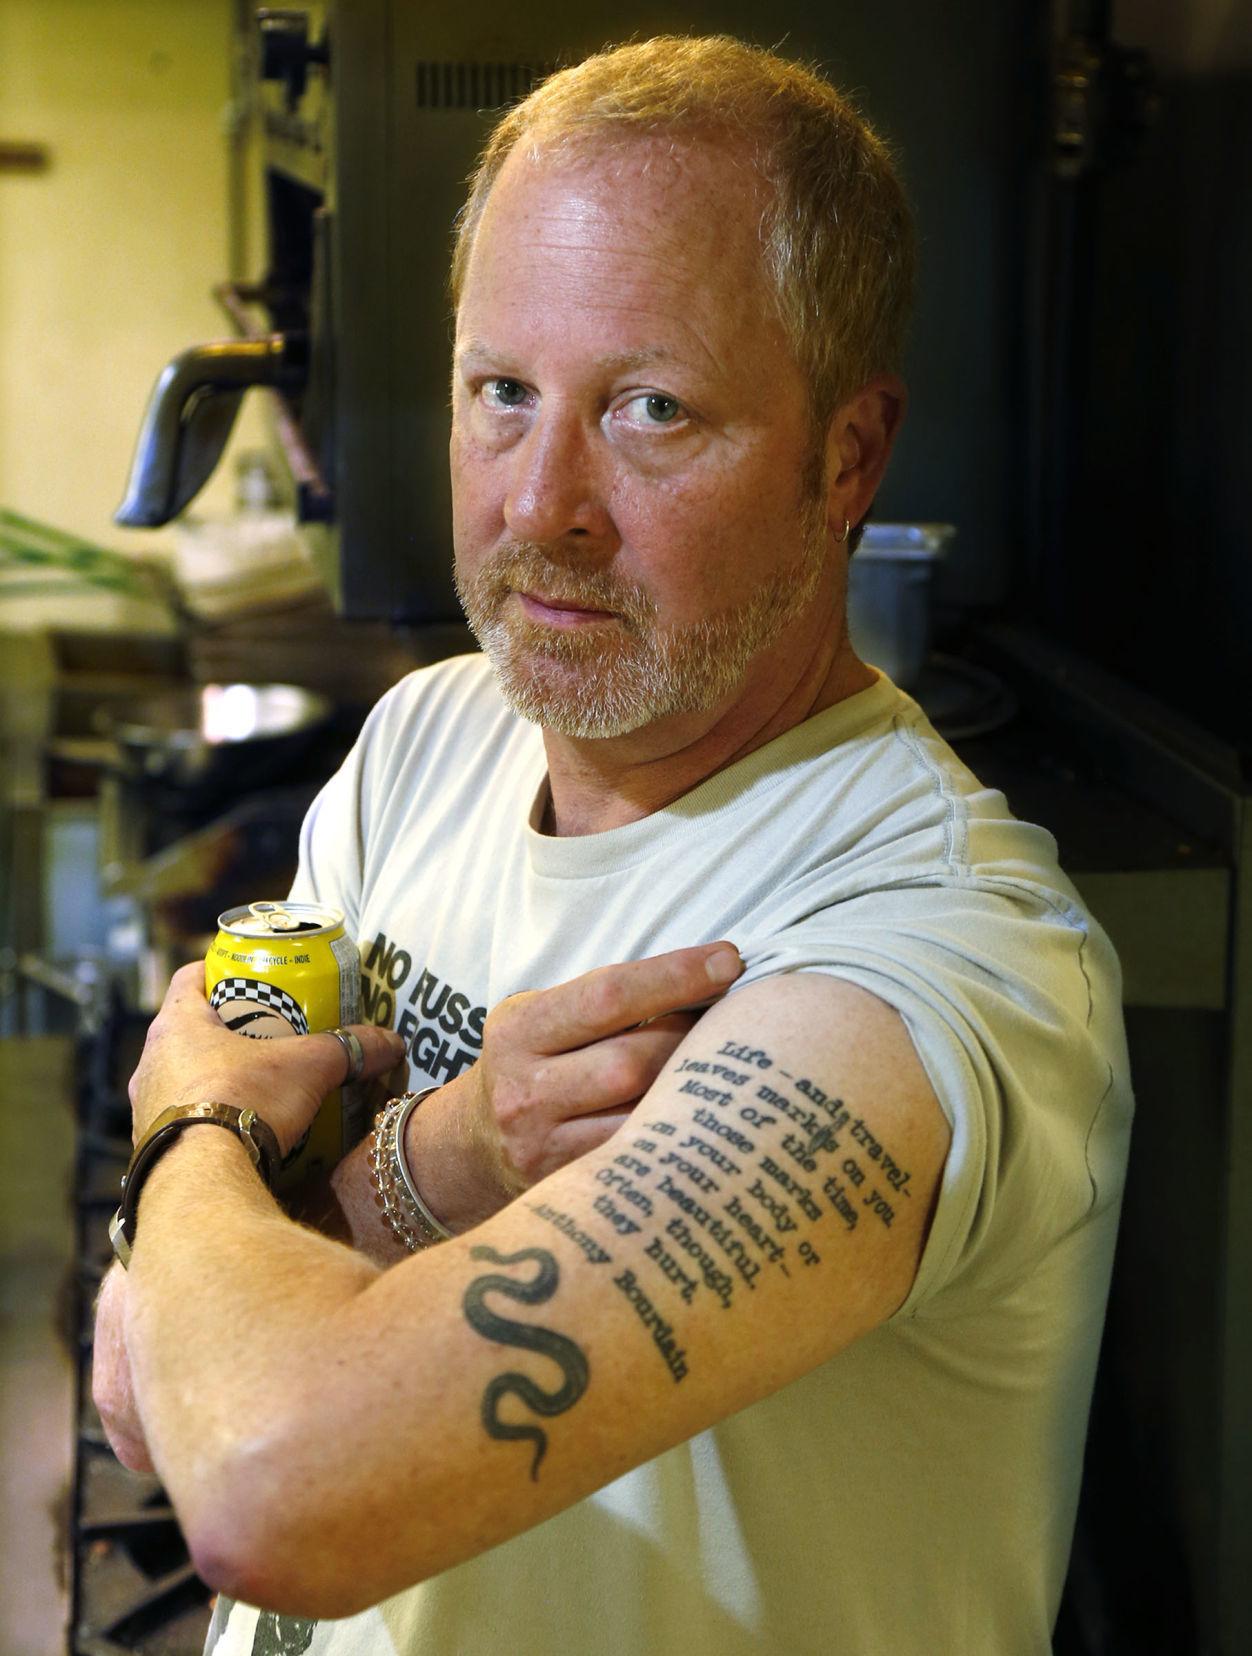 Top Local Chefs Share The Stories Behind Their Tattoos Tulsa World Magazine Tulsaworld Com